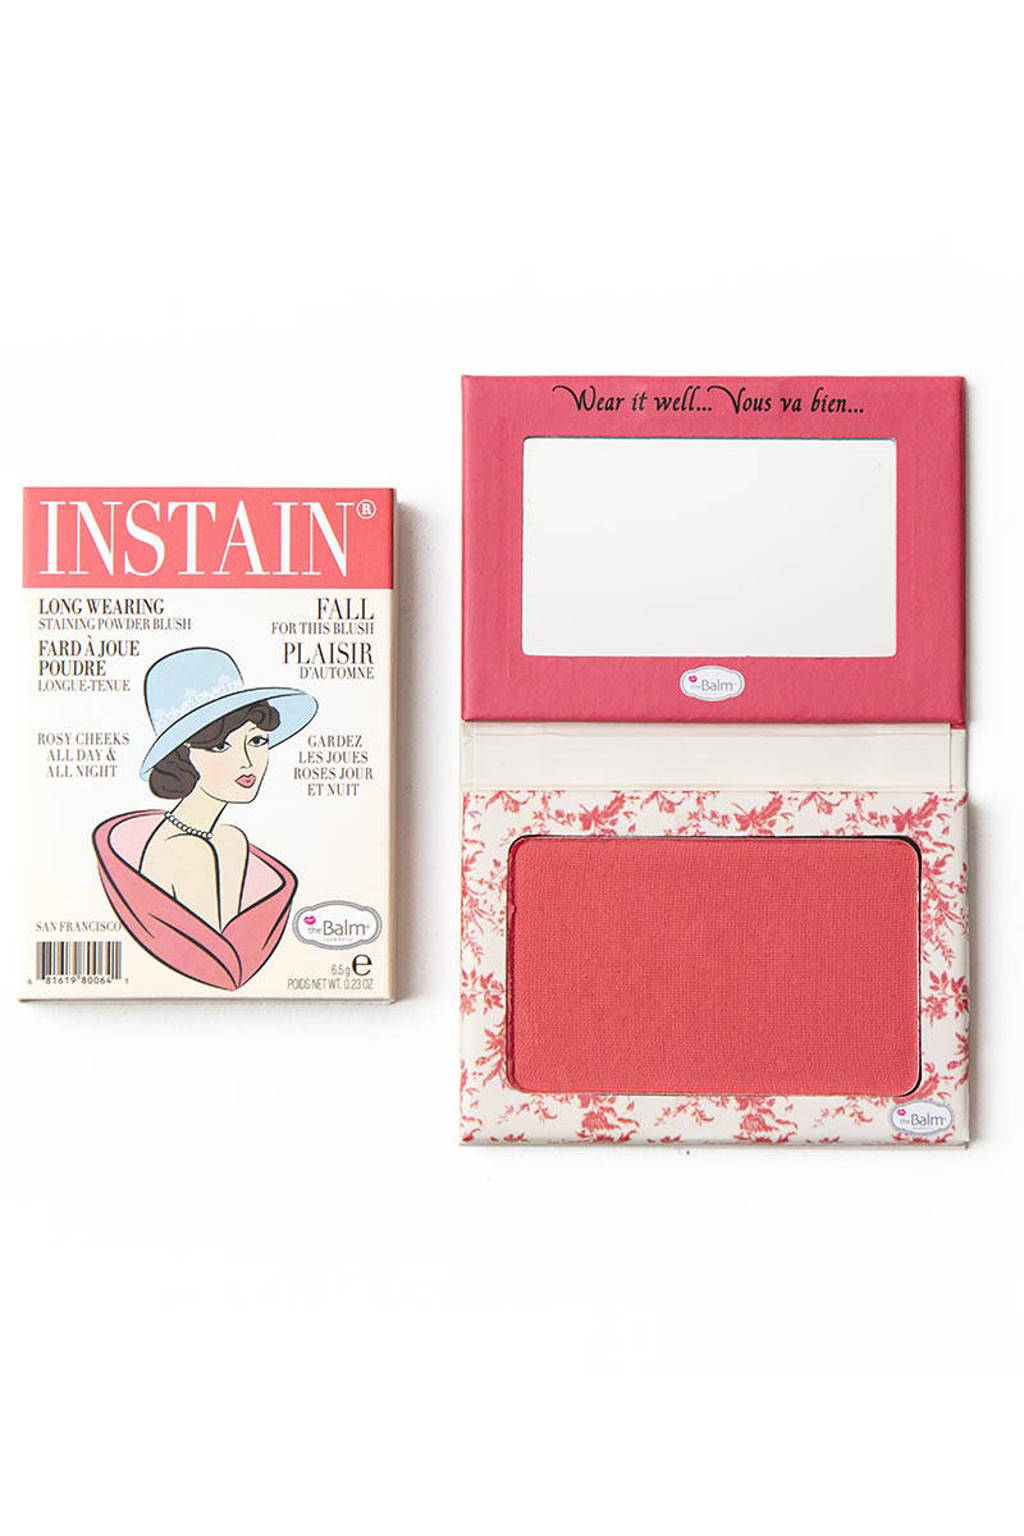 The Balm InStain blush - Toile, Strawberry